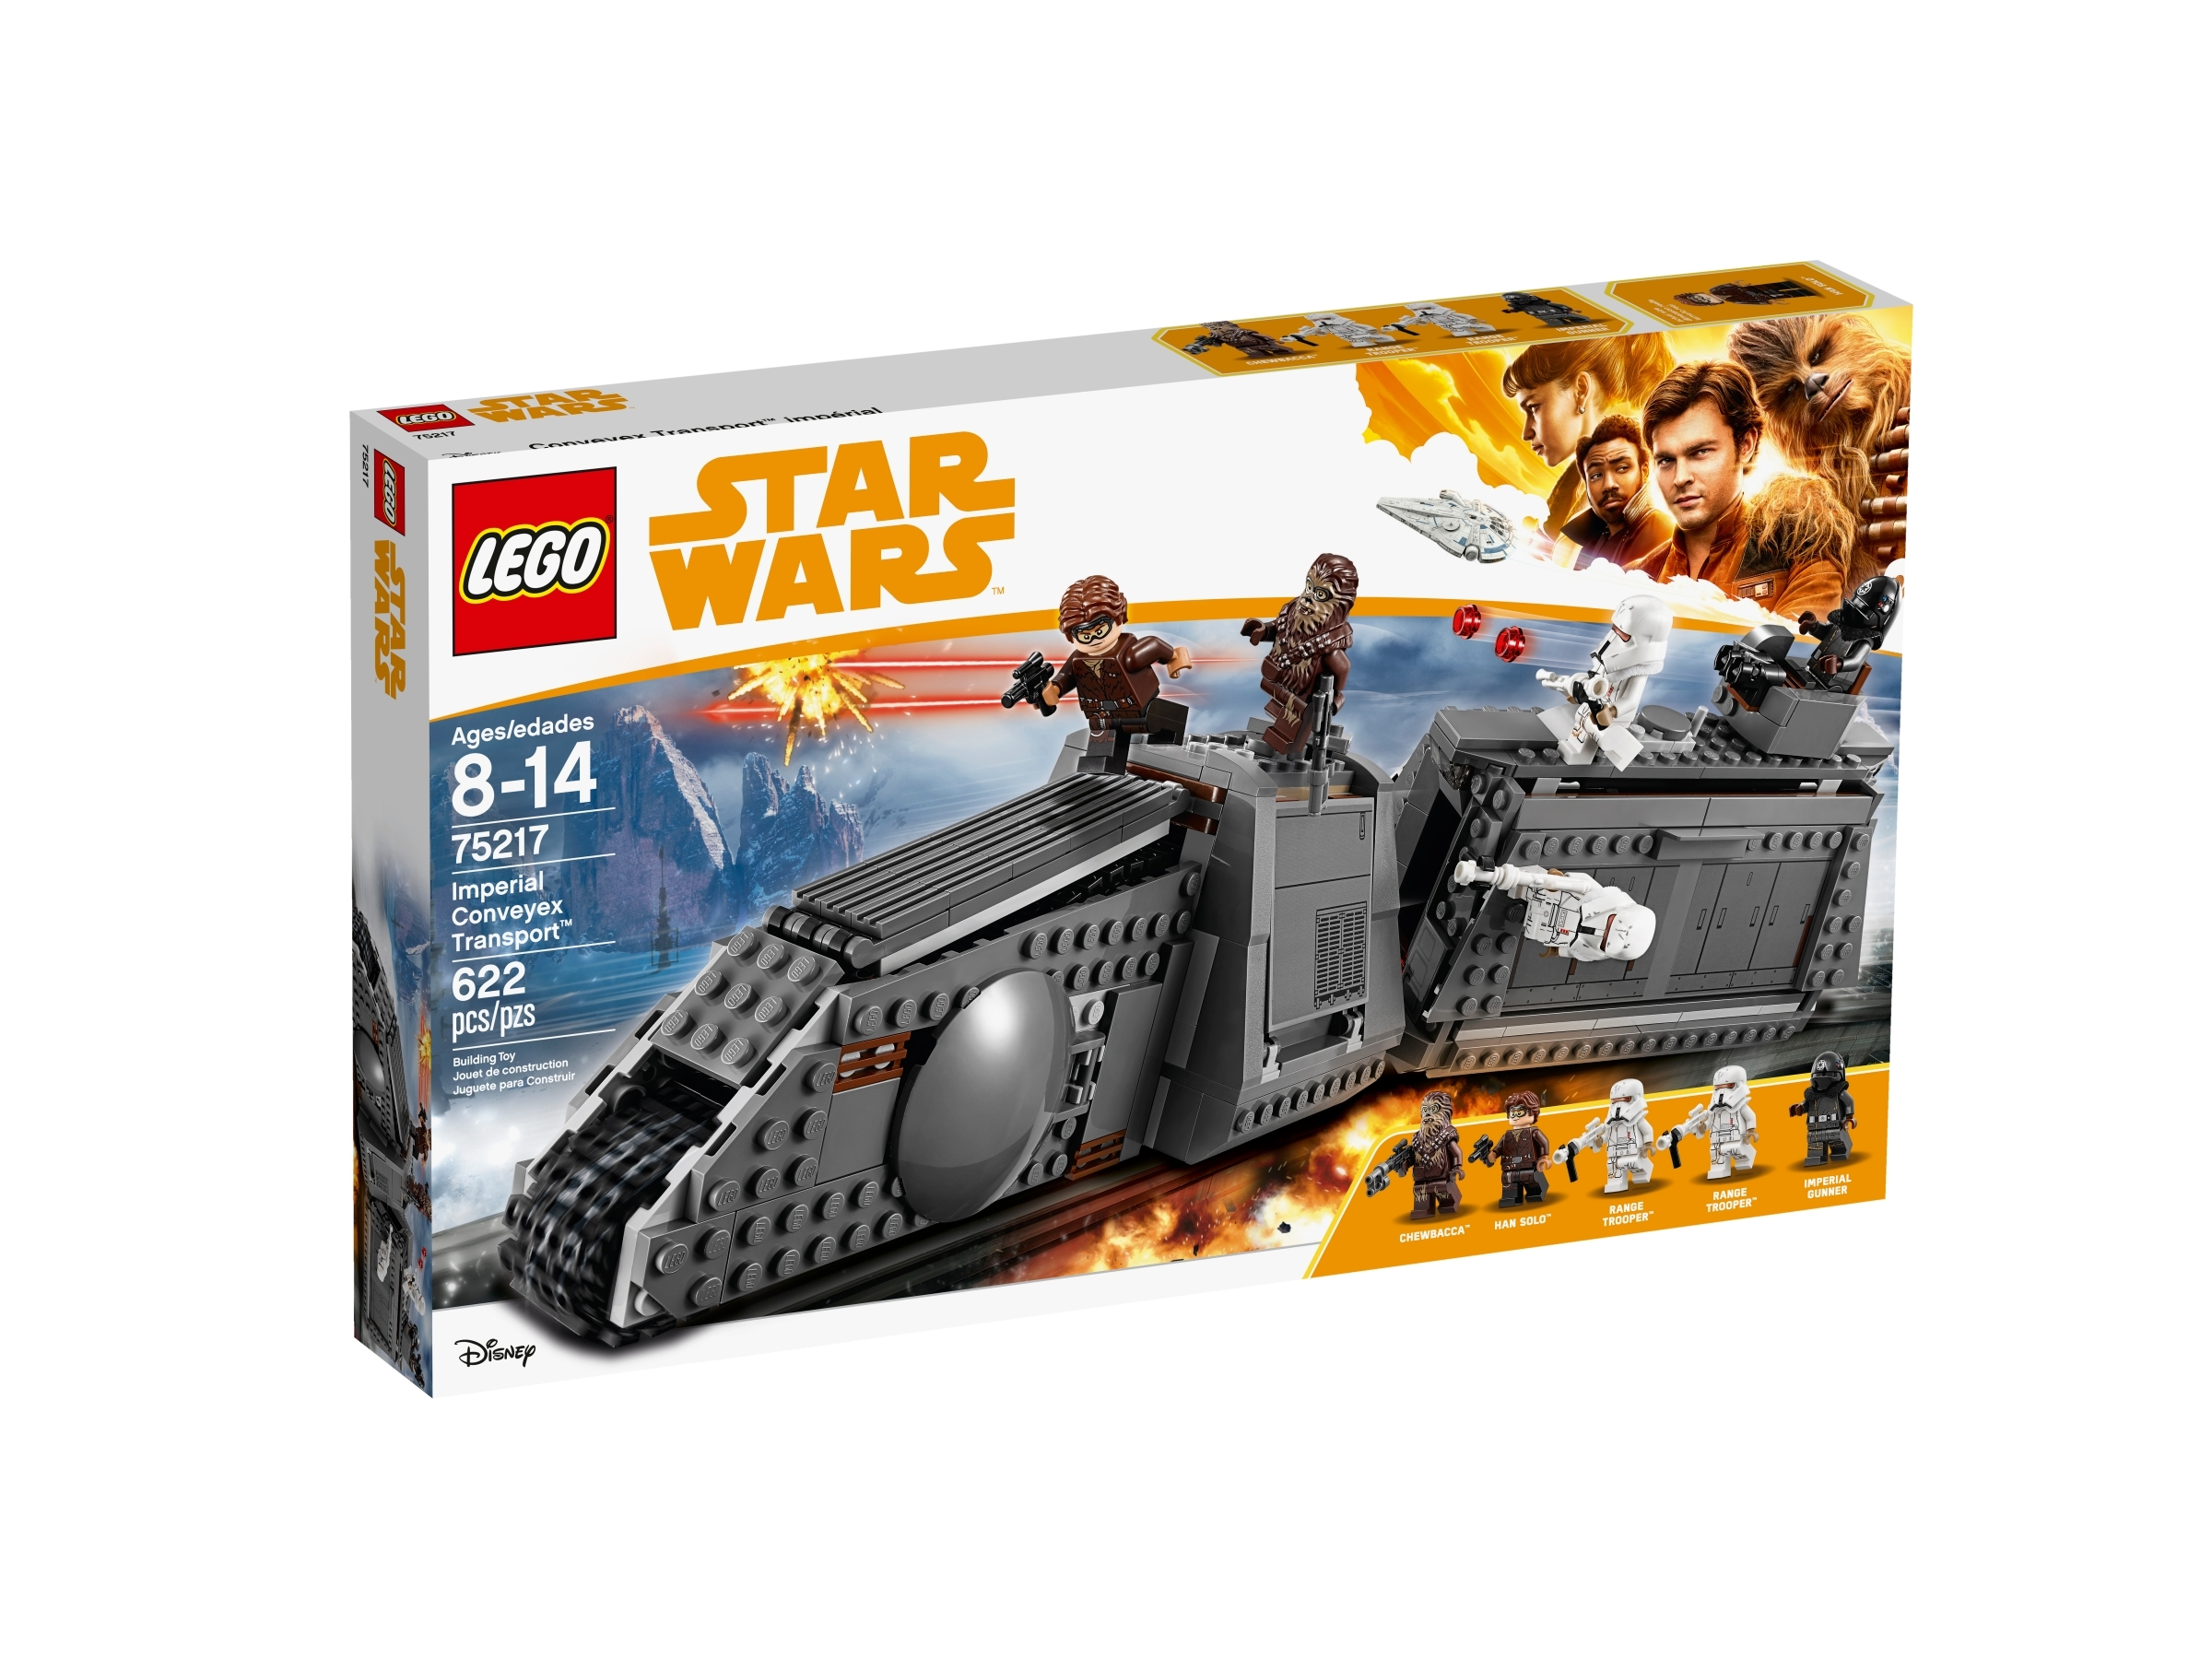 lego 75217 imperiumin conveyex transport